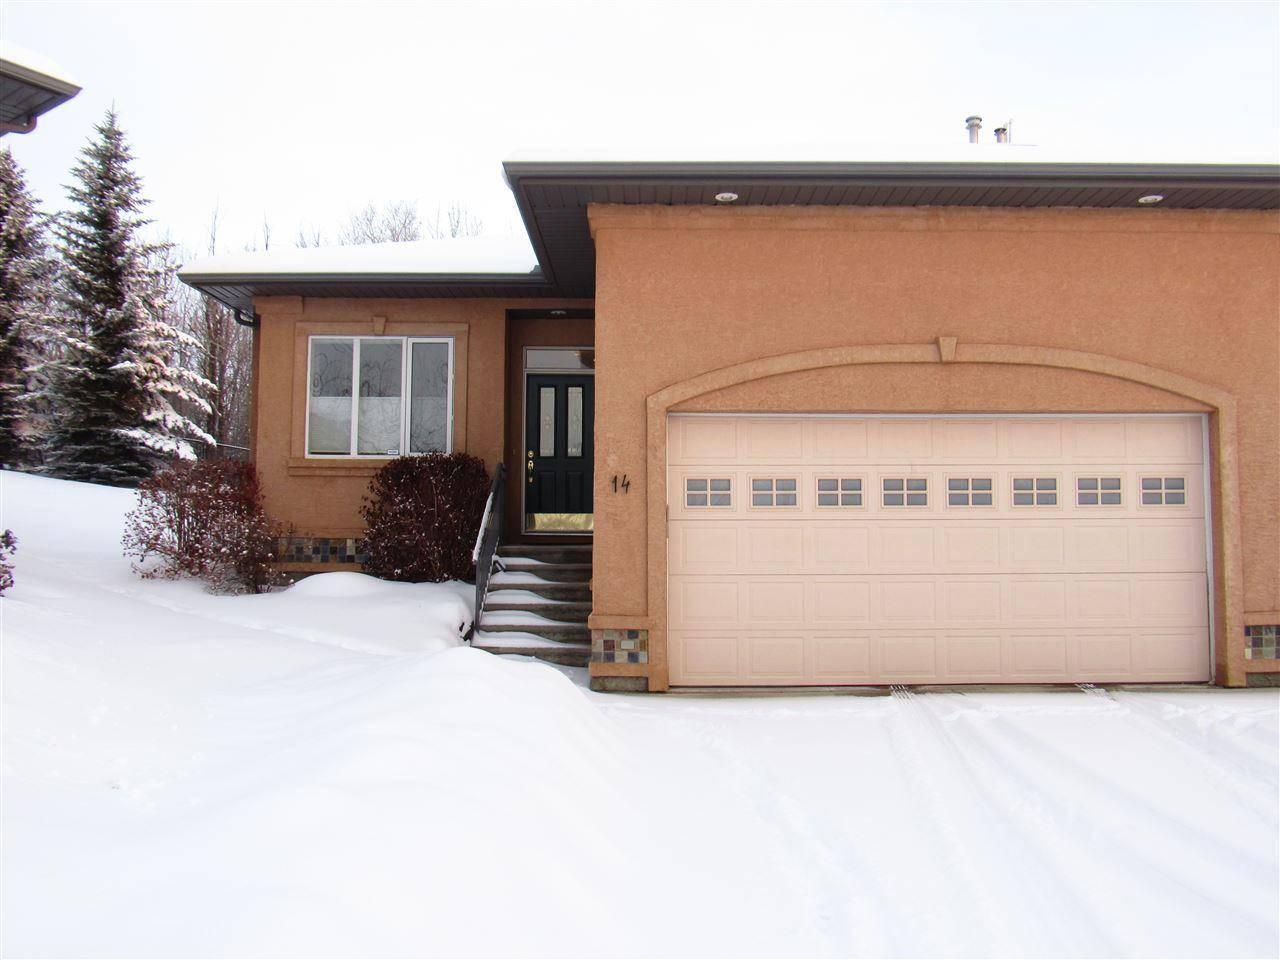 Townhouse for sale at 50 Oakridge Dr Unit 14 St. Albert Alberta - MLS: E4184433